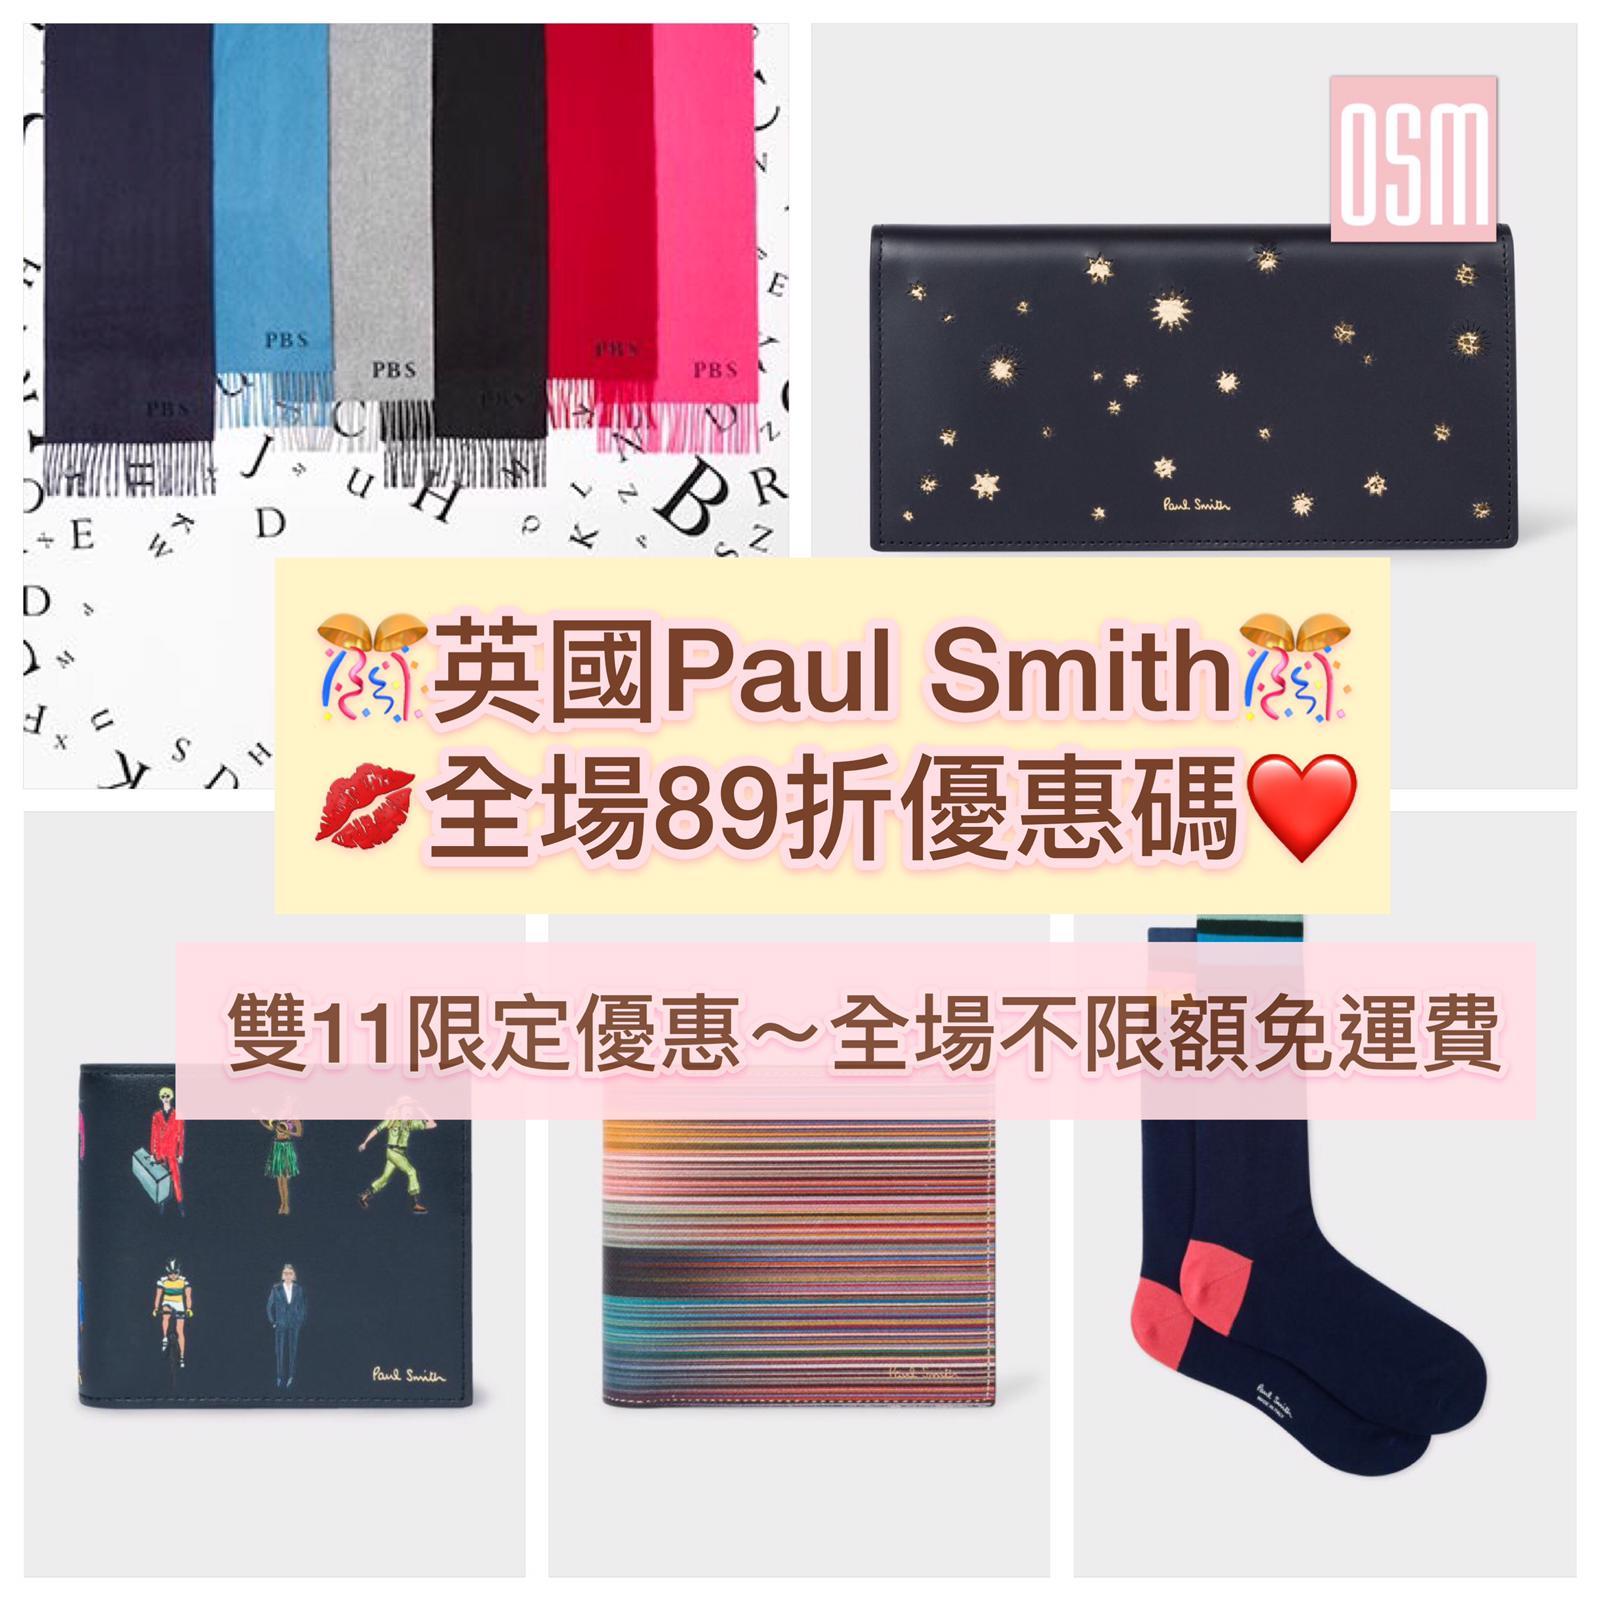 Paul Smith 雙11優惠碼+無最低消費全場免運費